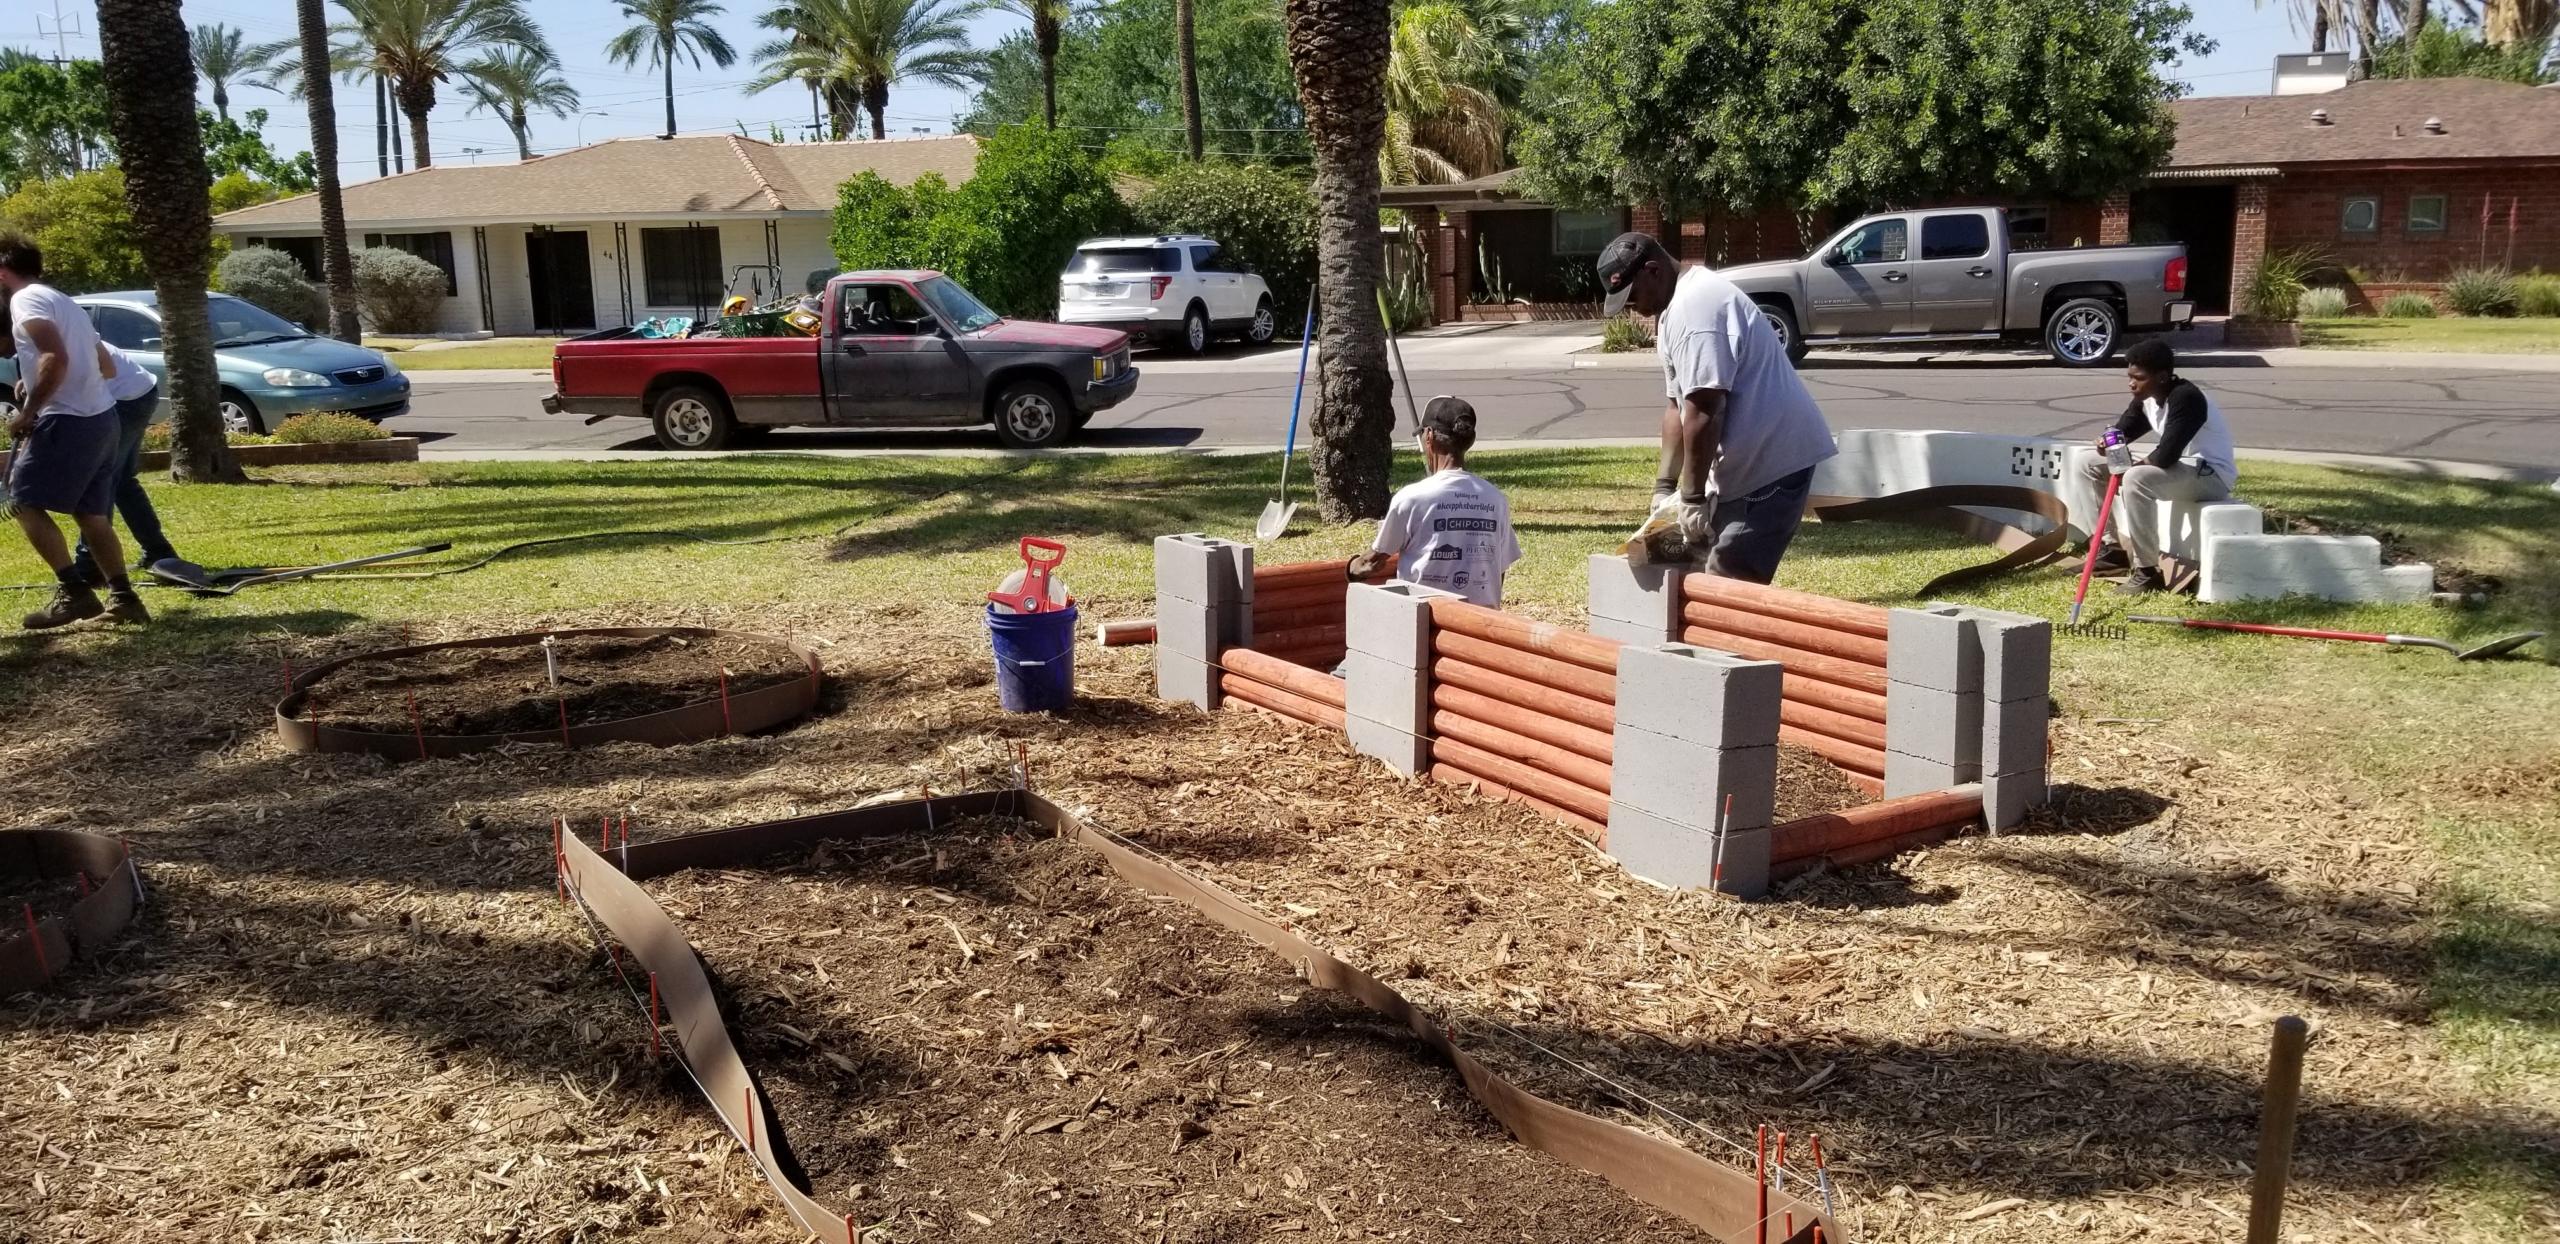 Alternatives to food in Phoenix, AZ